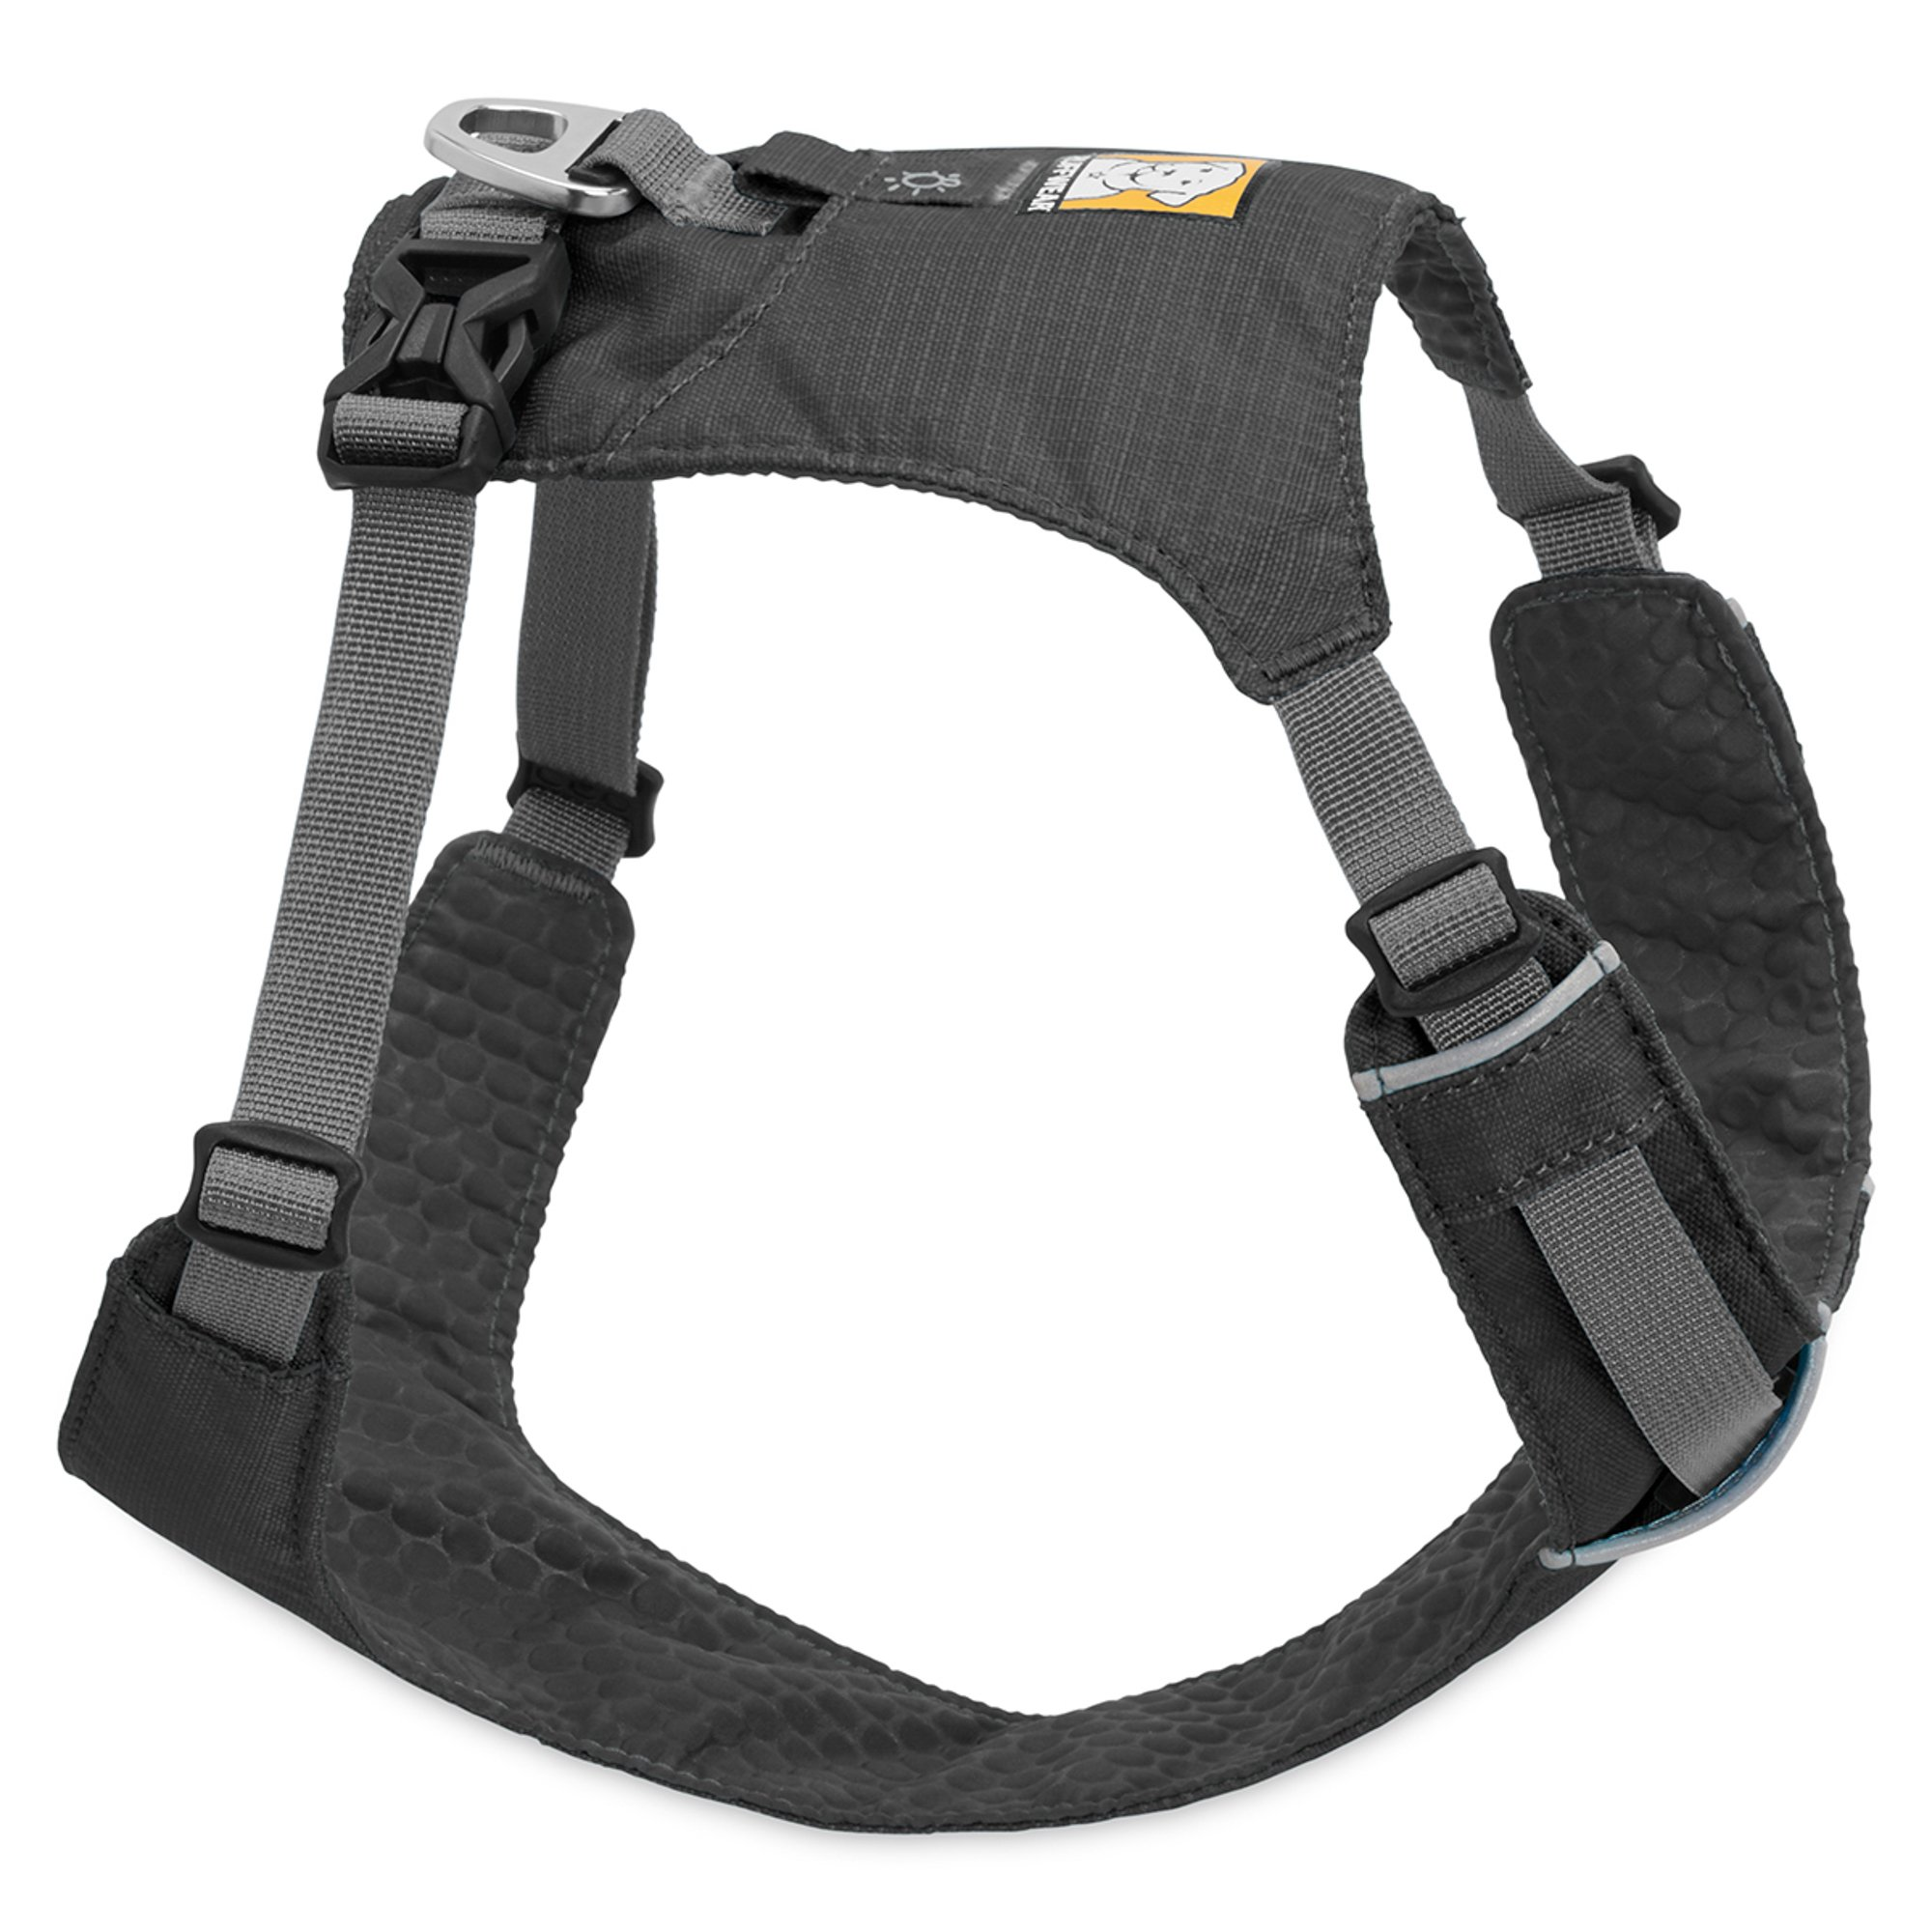 RUFFWEAR - Hi & Light Lightweight Dog Harness, Twilight Gray, Small